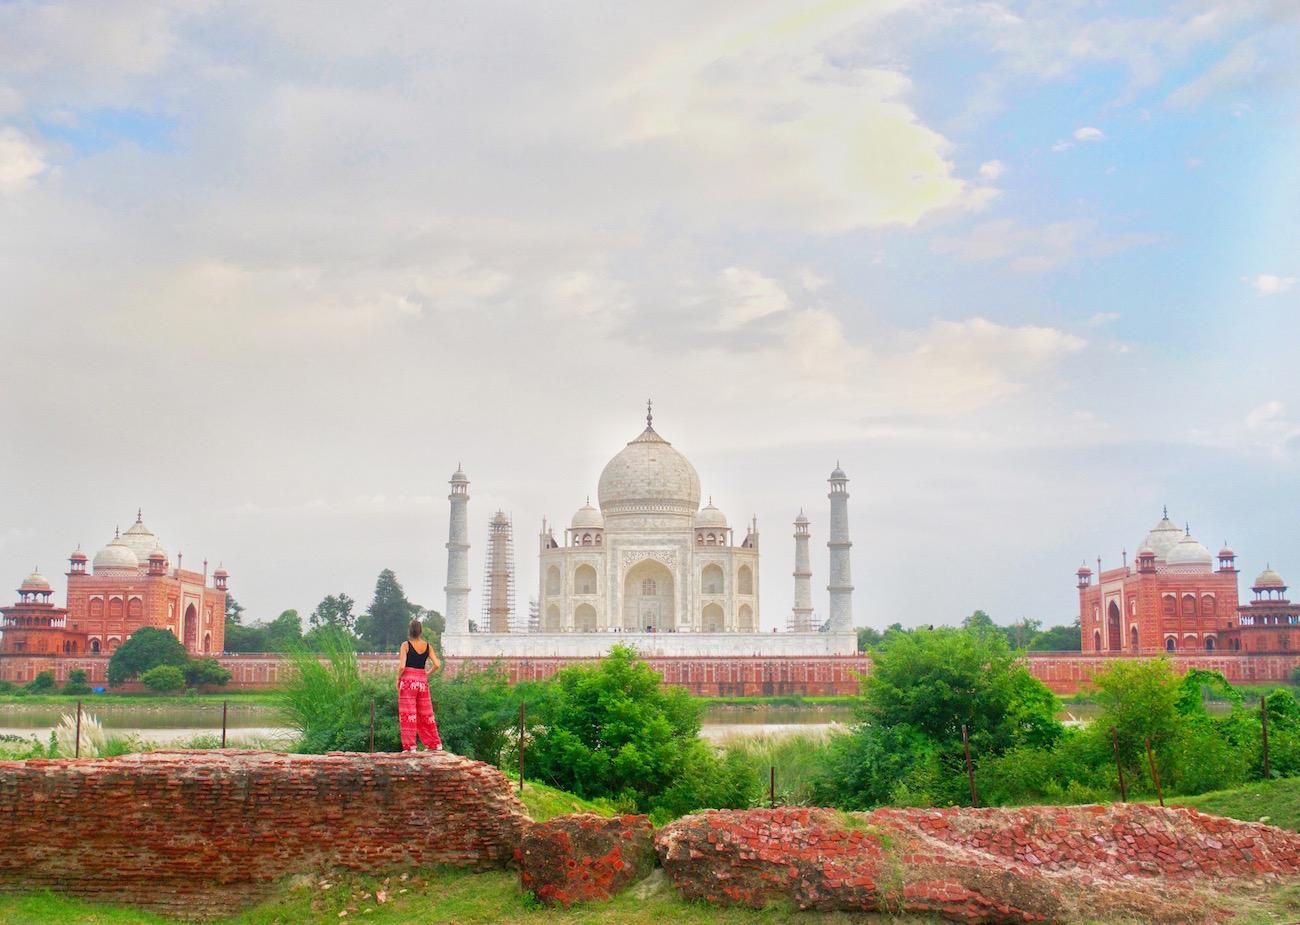 Taj-mahal-from-behind